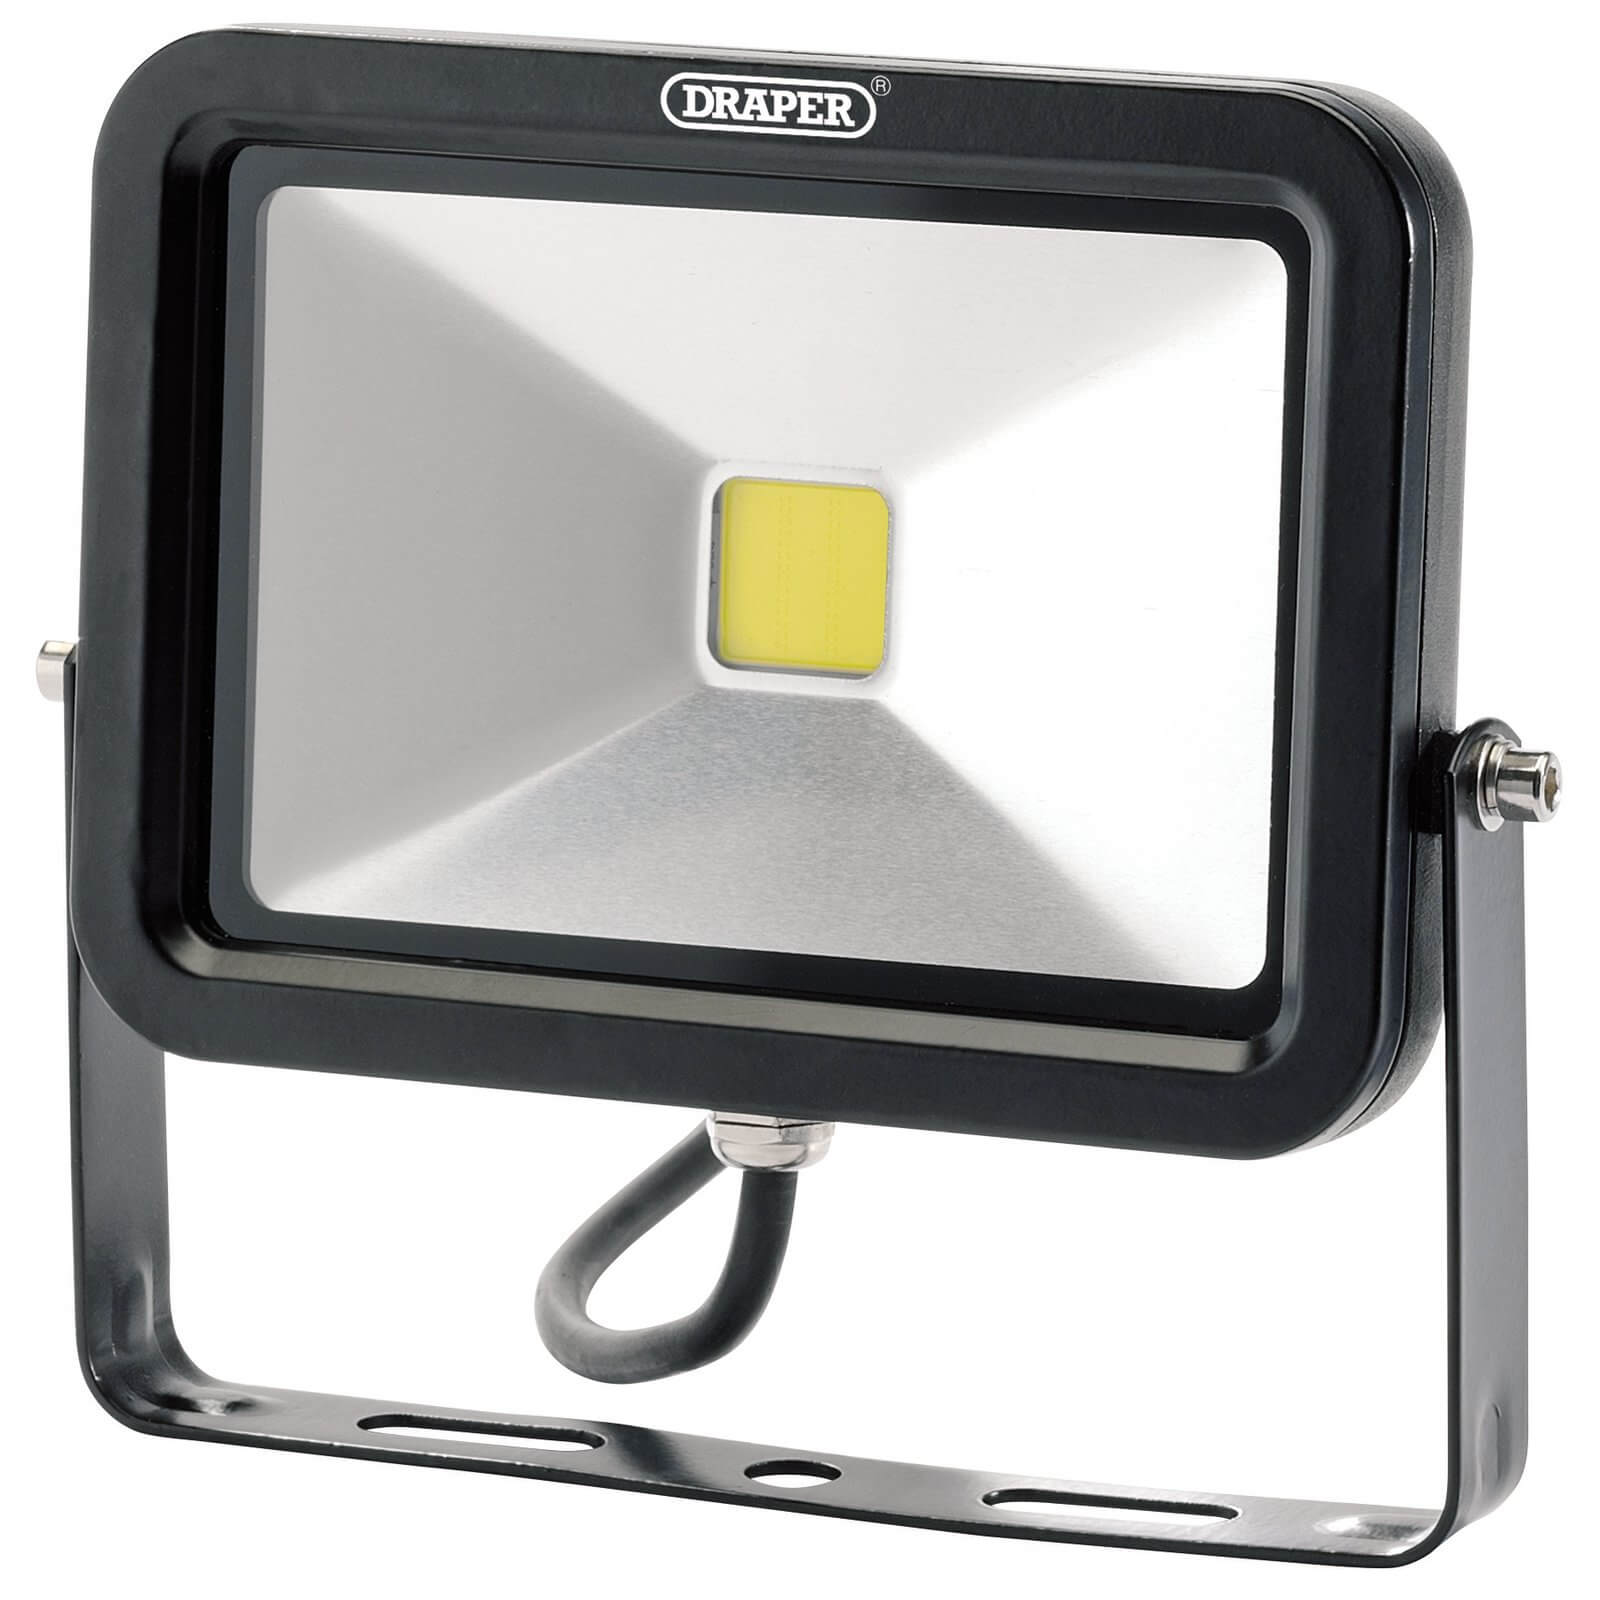 Image of Draper COB LED Slimeline Wall Mounted Floodlight 20 Watts